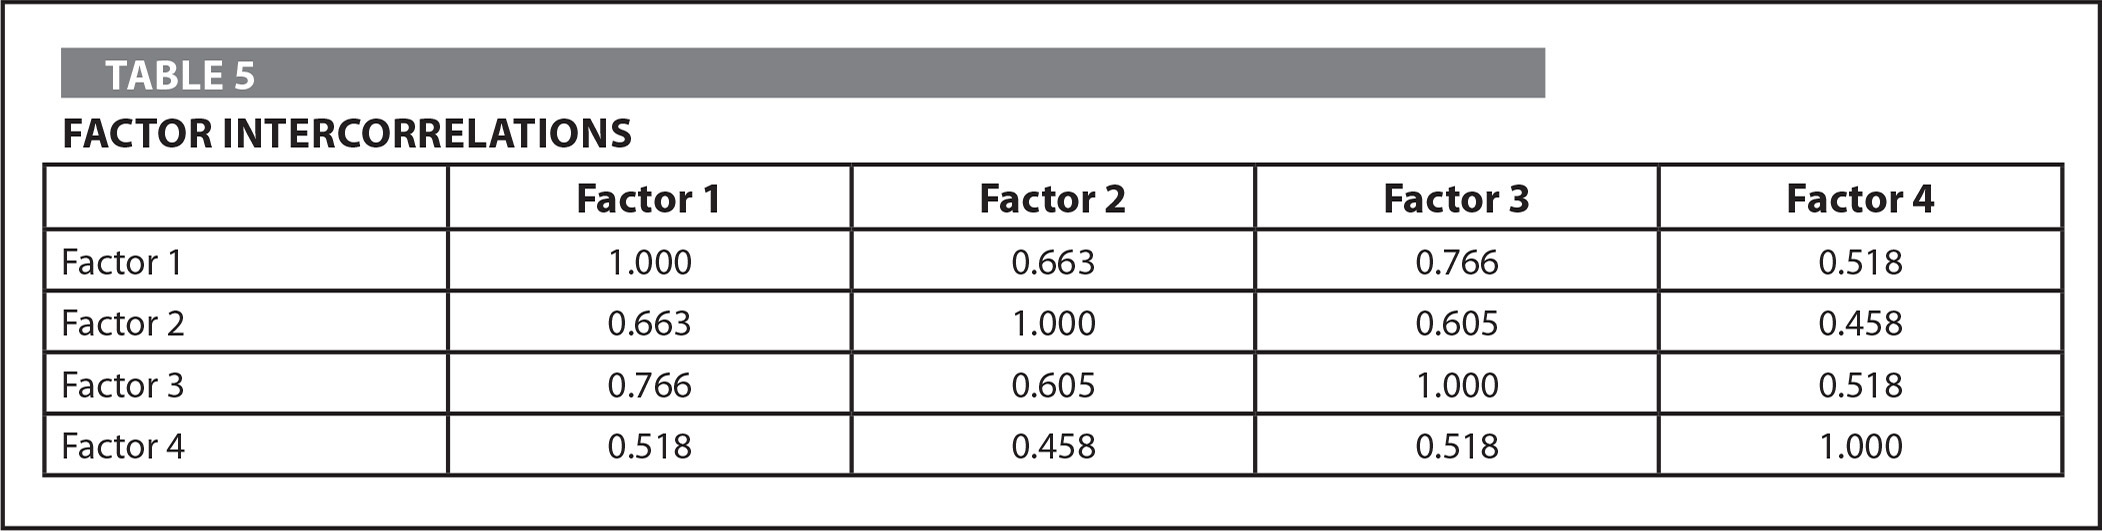 Factor Intercorrelations